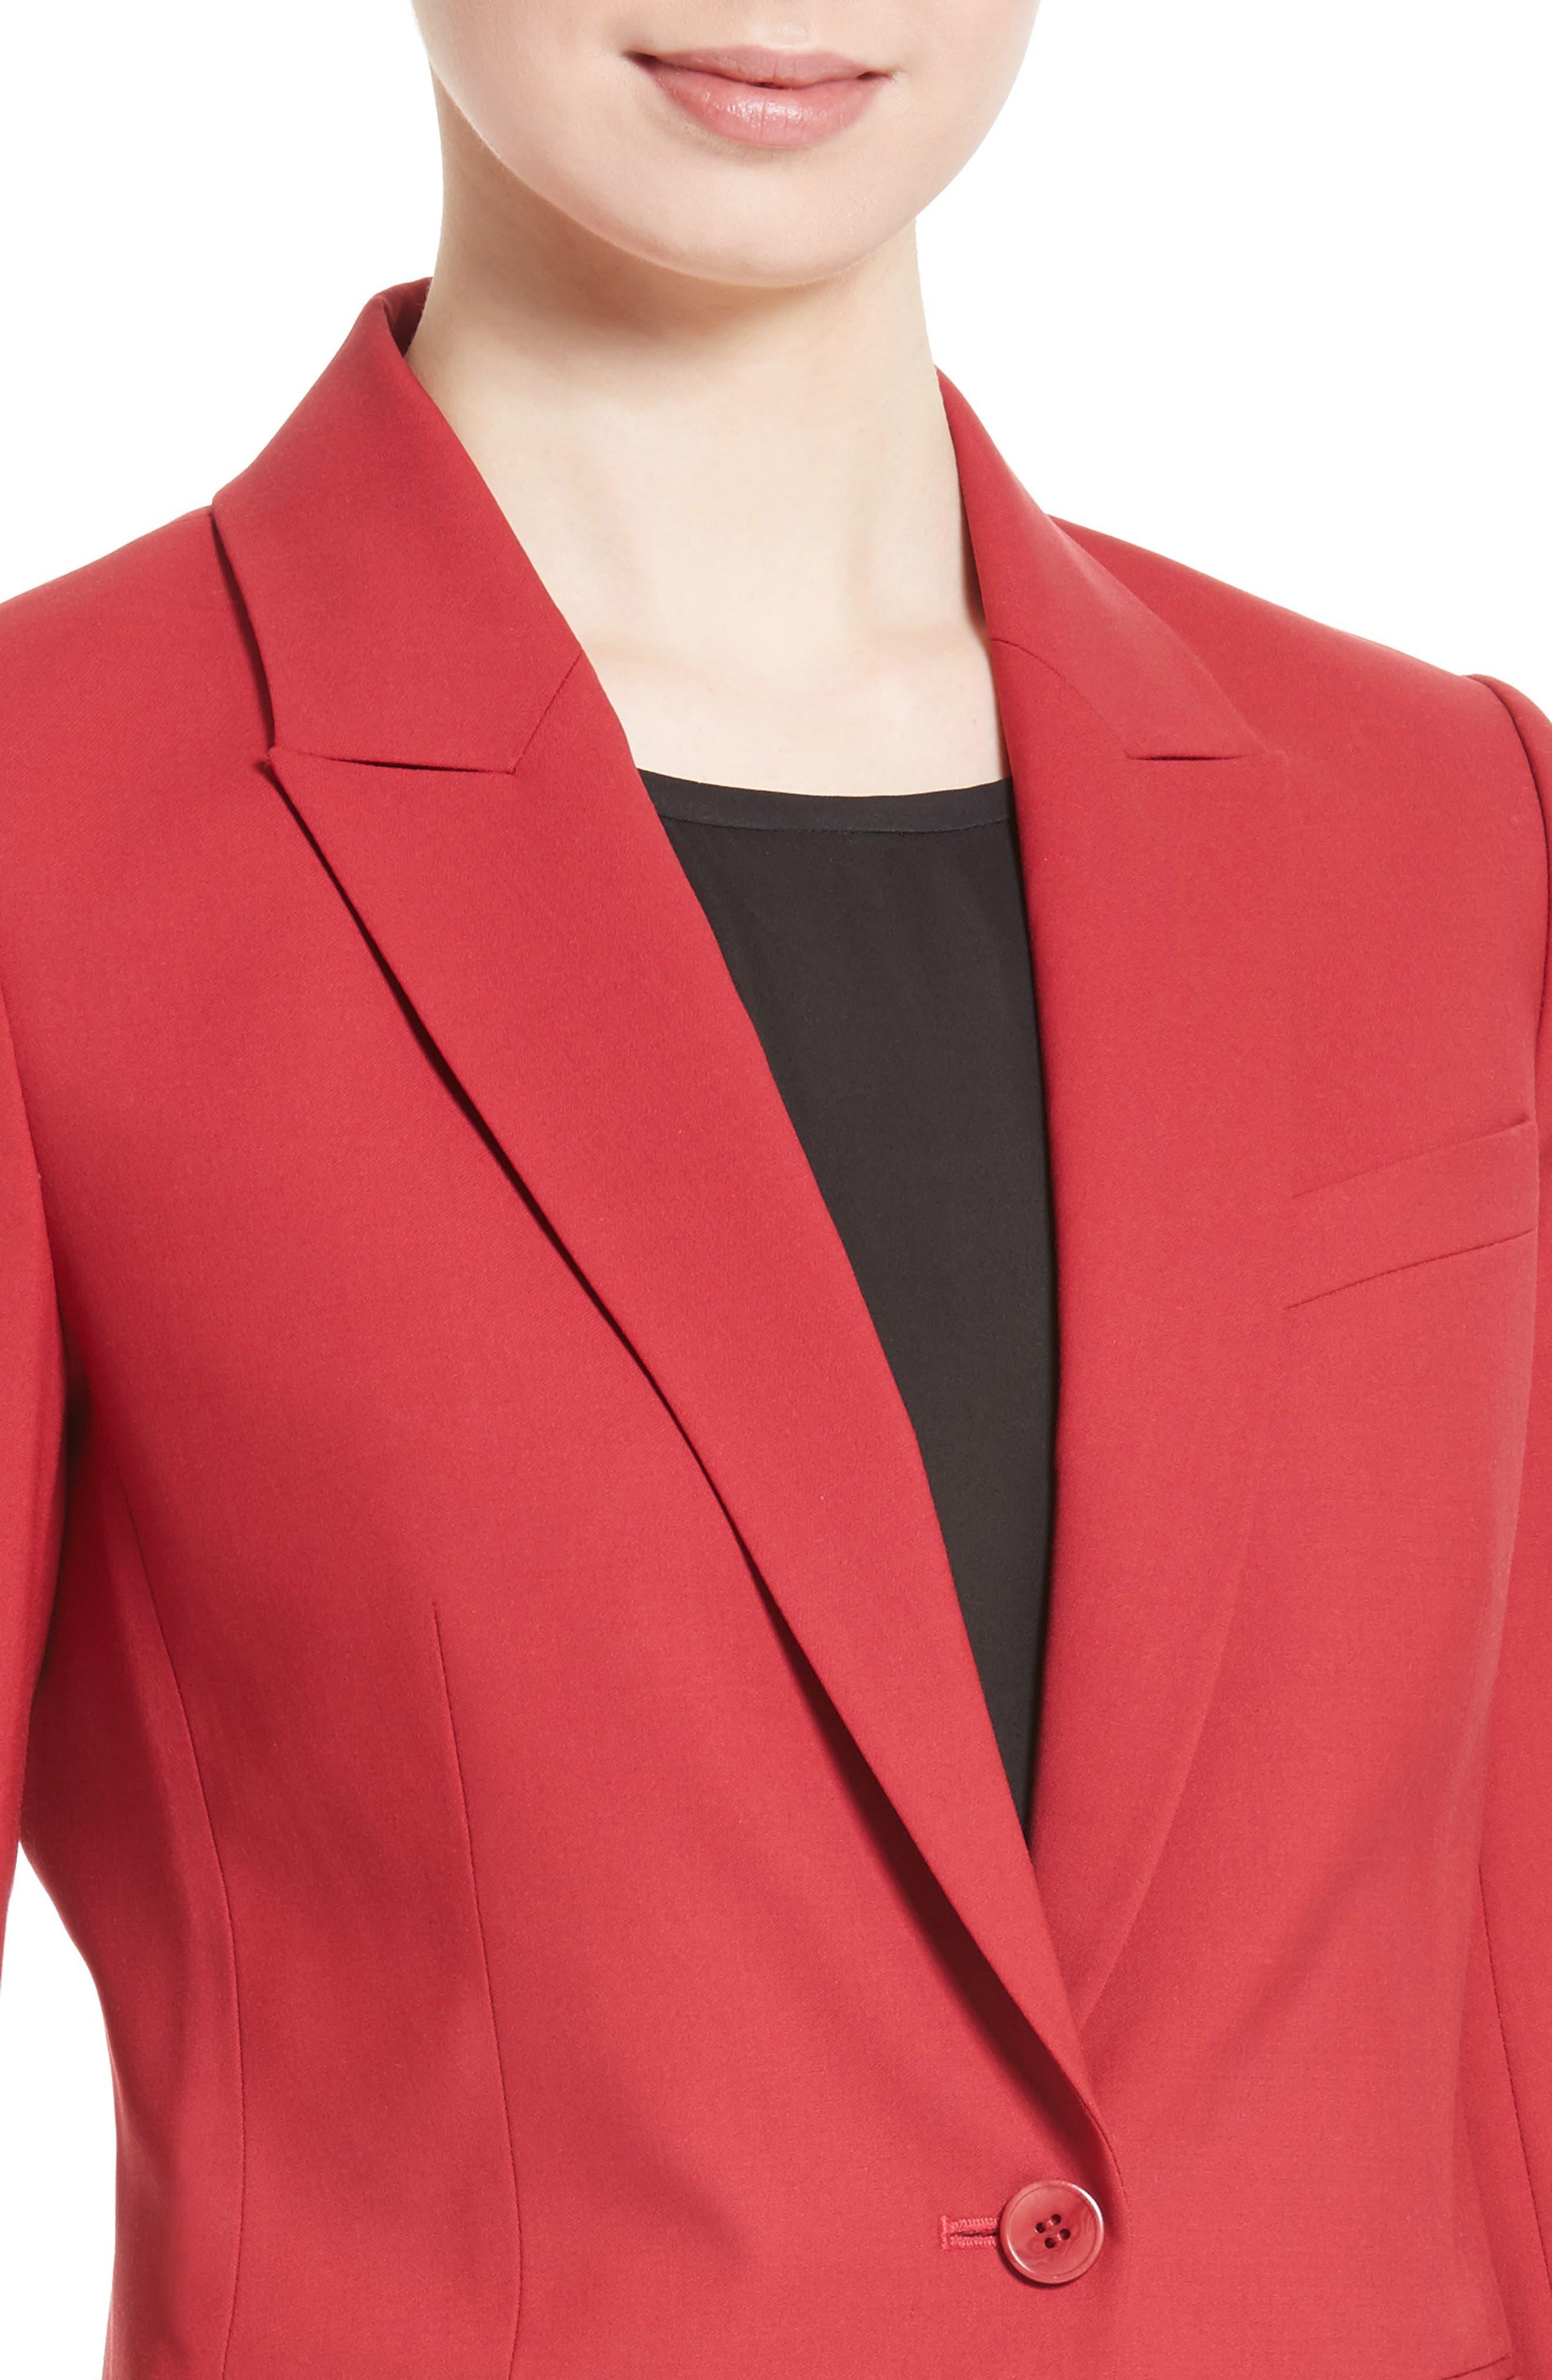 Etienette B Good Wool Suit Jacket,                             Alternate thumbnail 32, color,